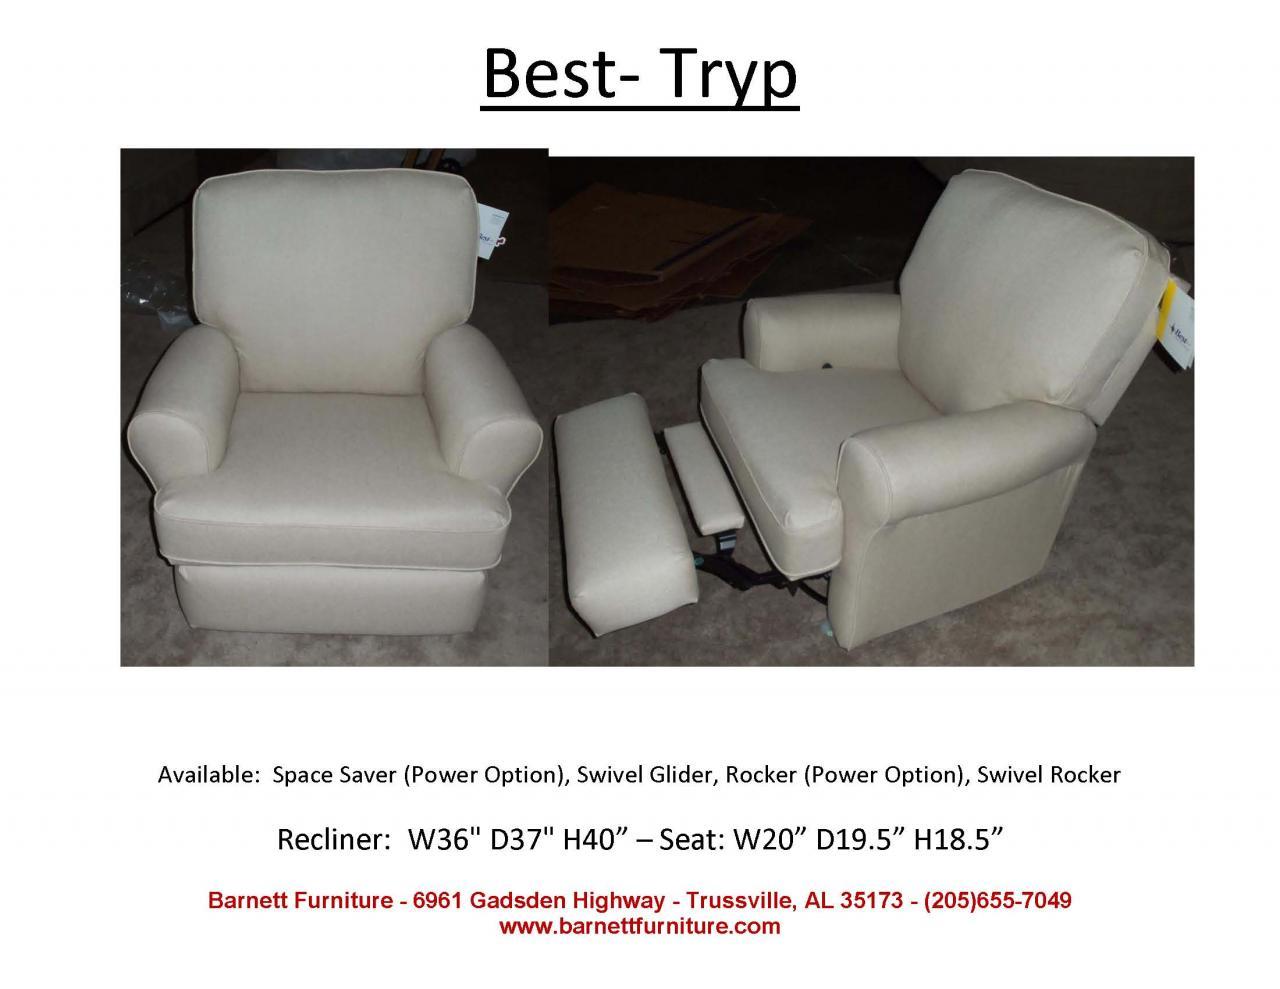 best chairs swivel glider recliner modern wingback barnett furniture gliders chair medium tryp